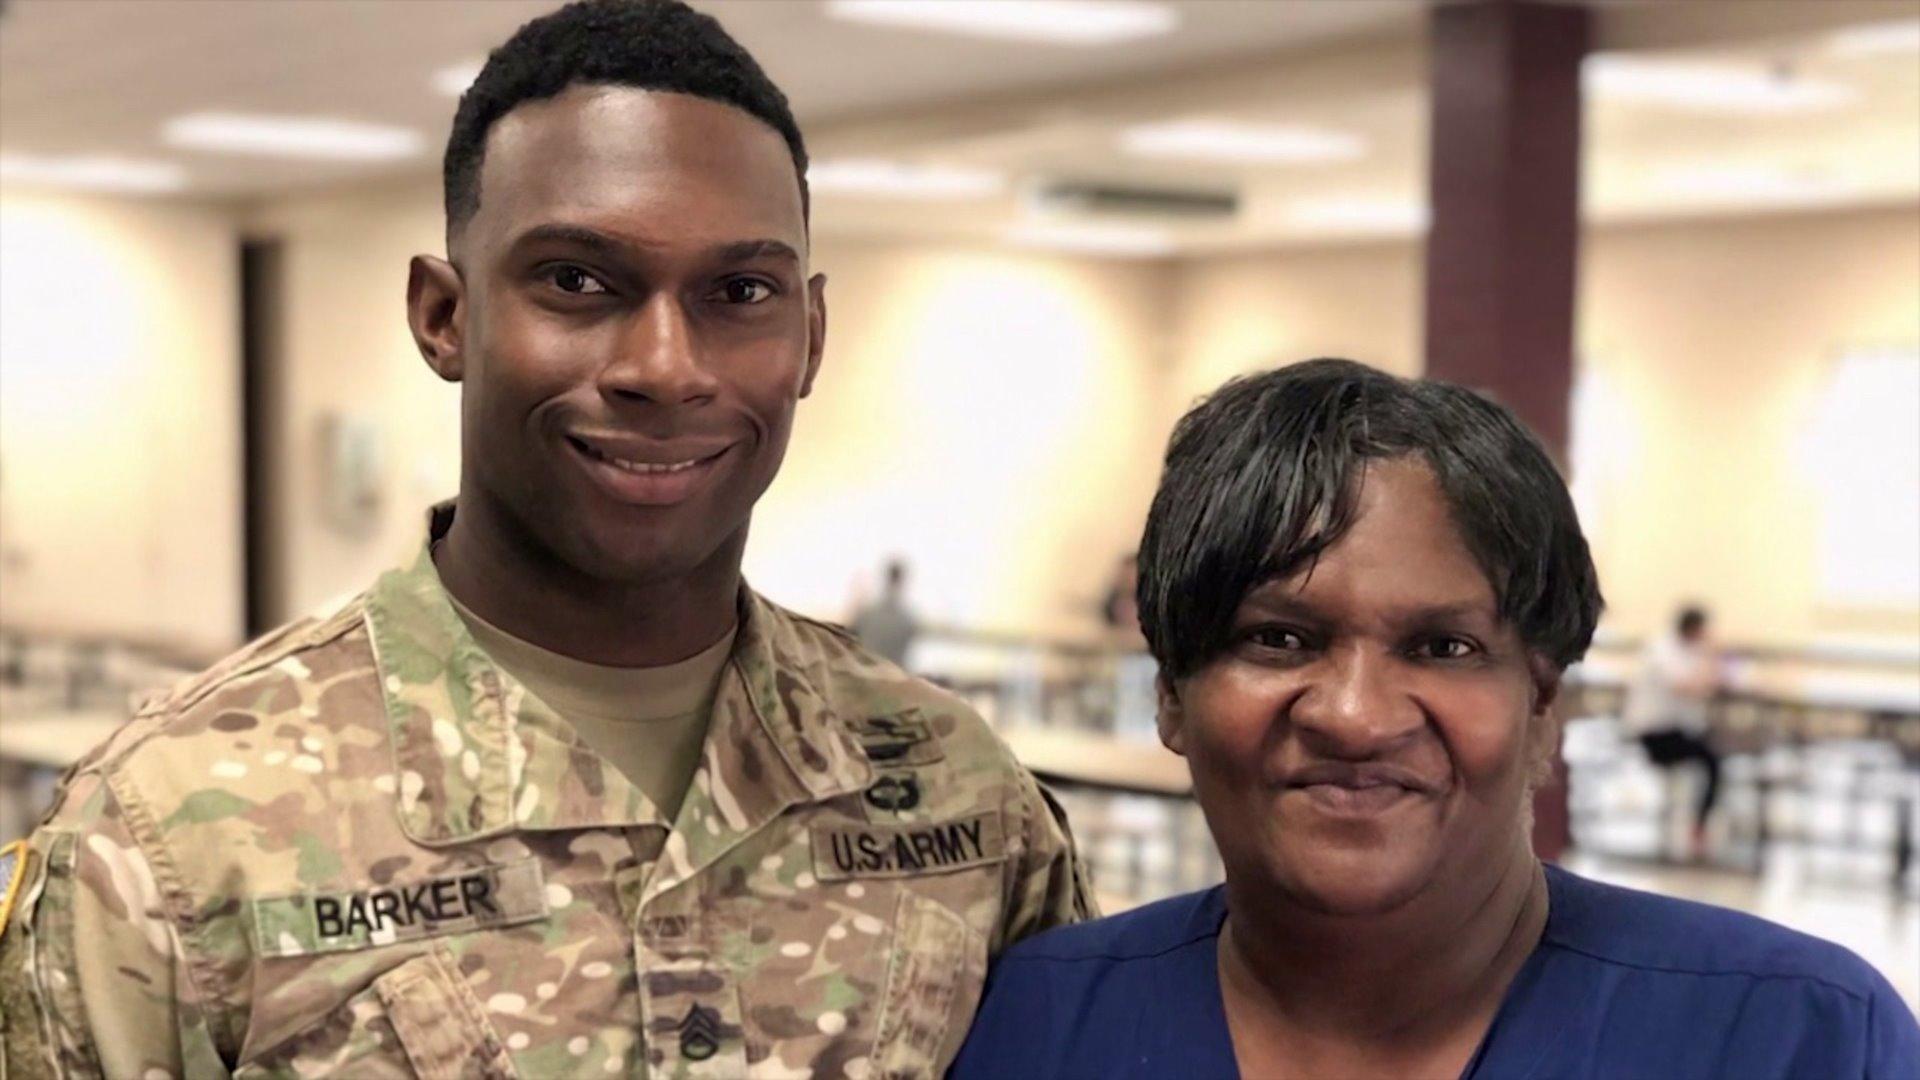 Fort Bragg soldier surprises mom at school